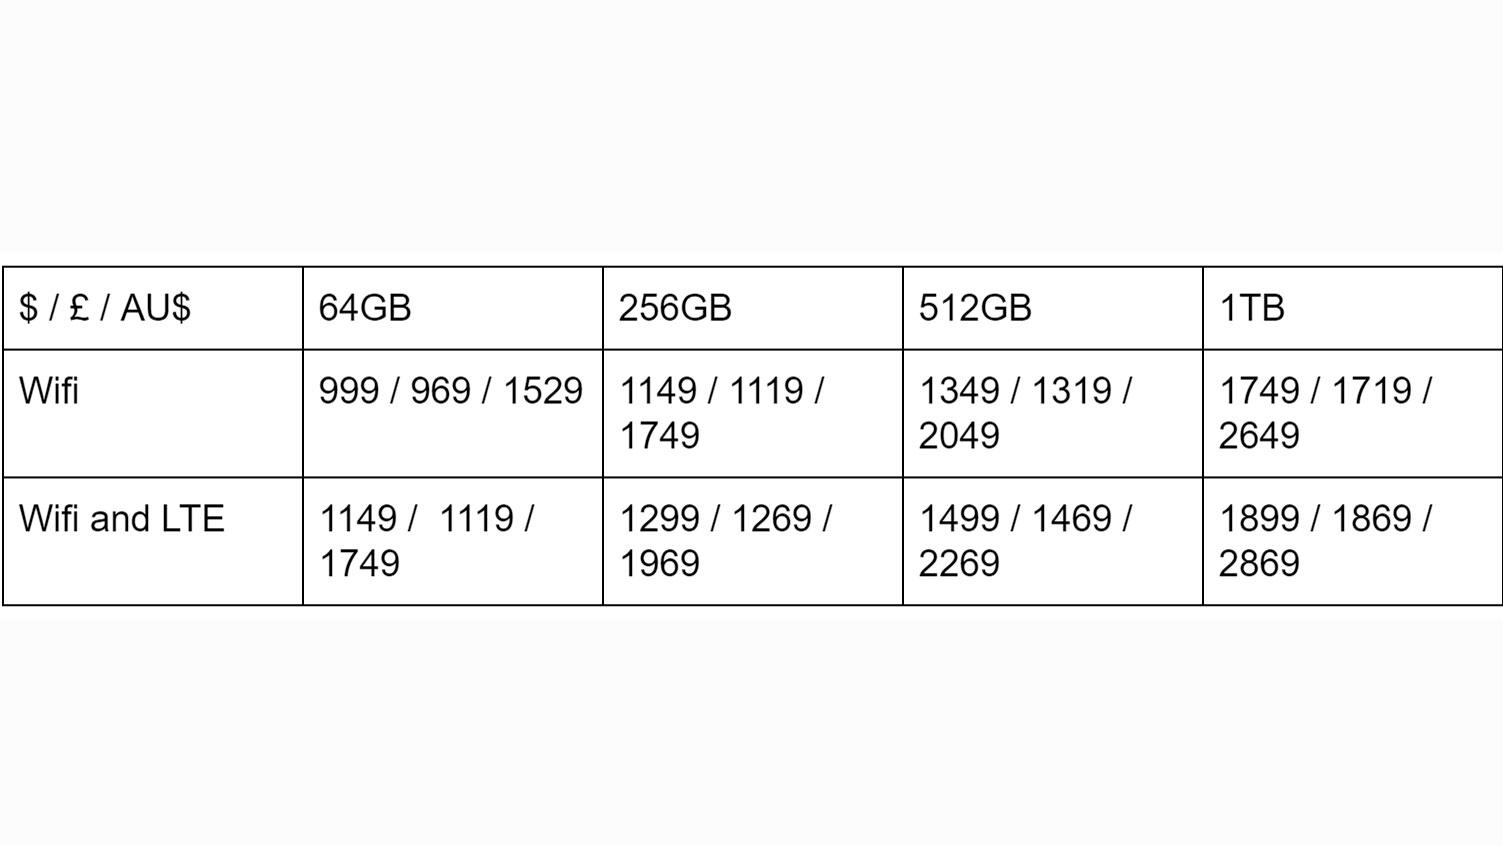 iPad Pro 12.9 (2018) prices. Image credit: TechRadar